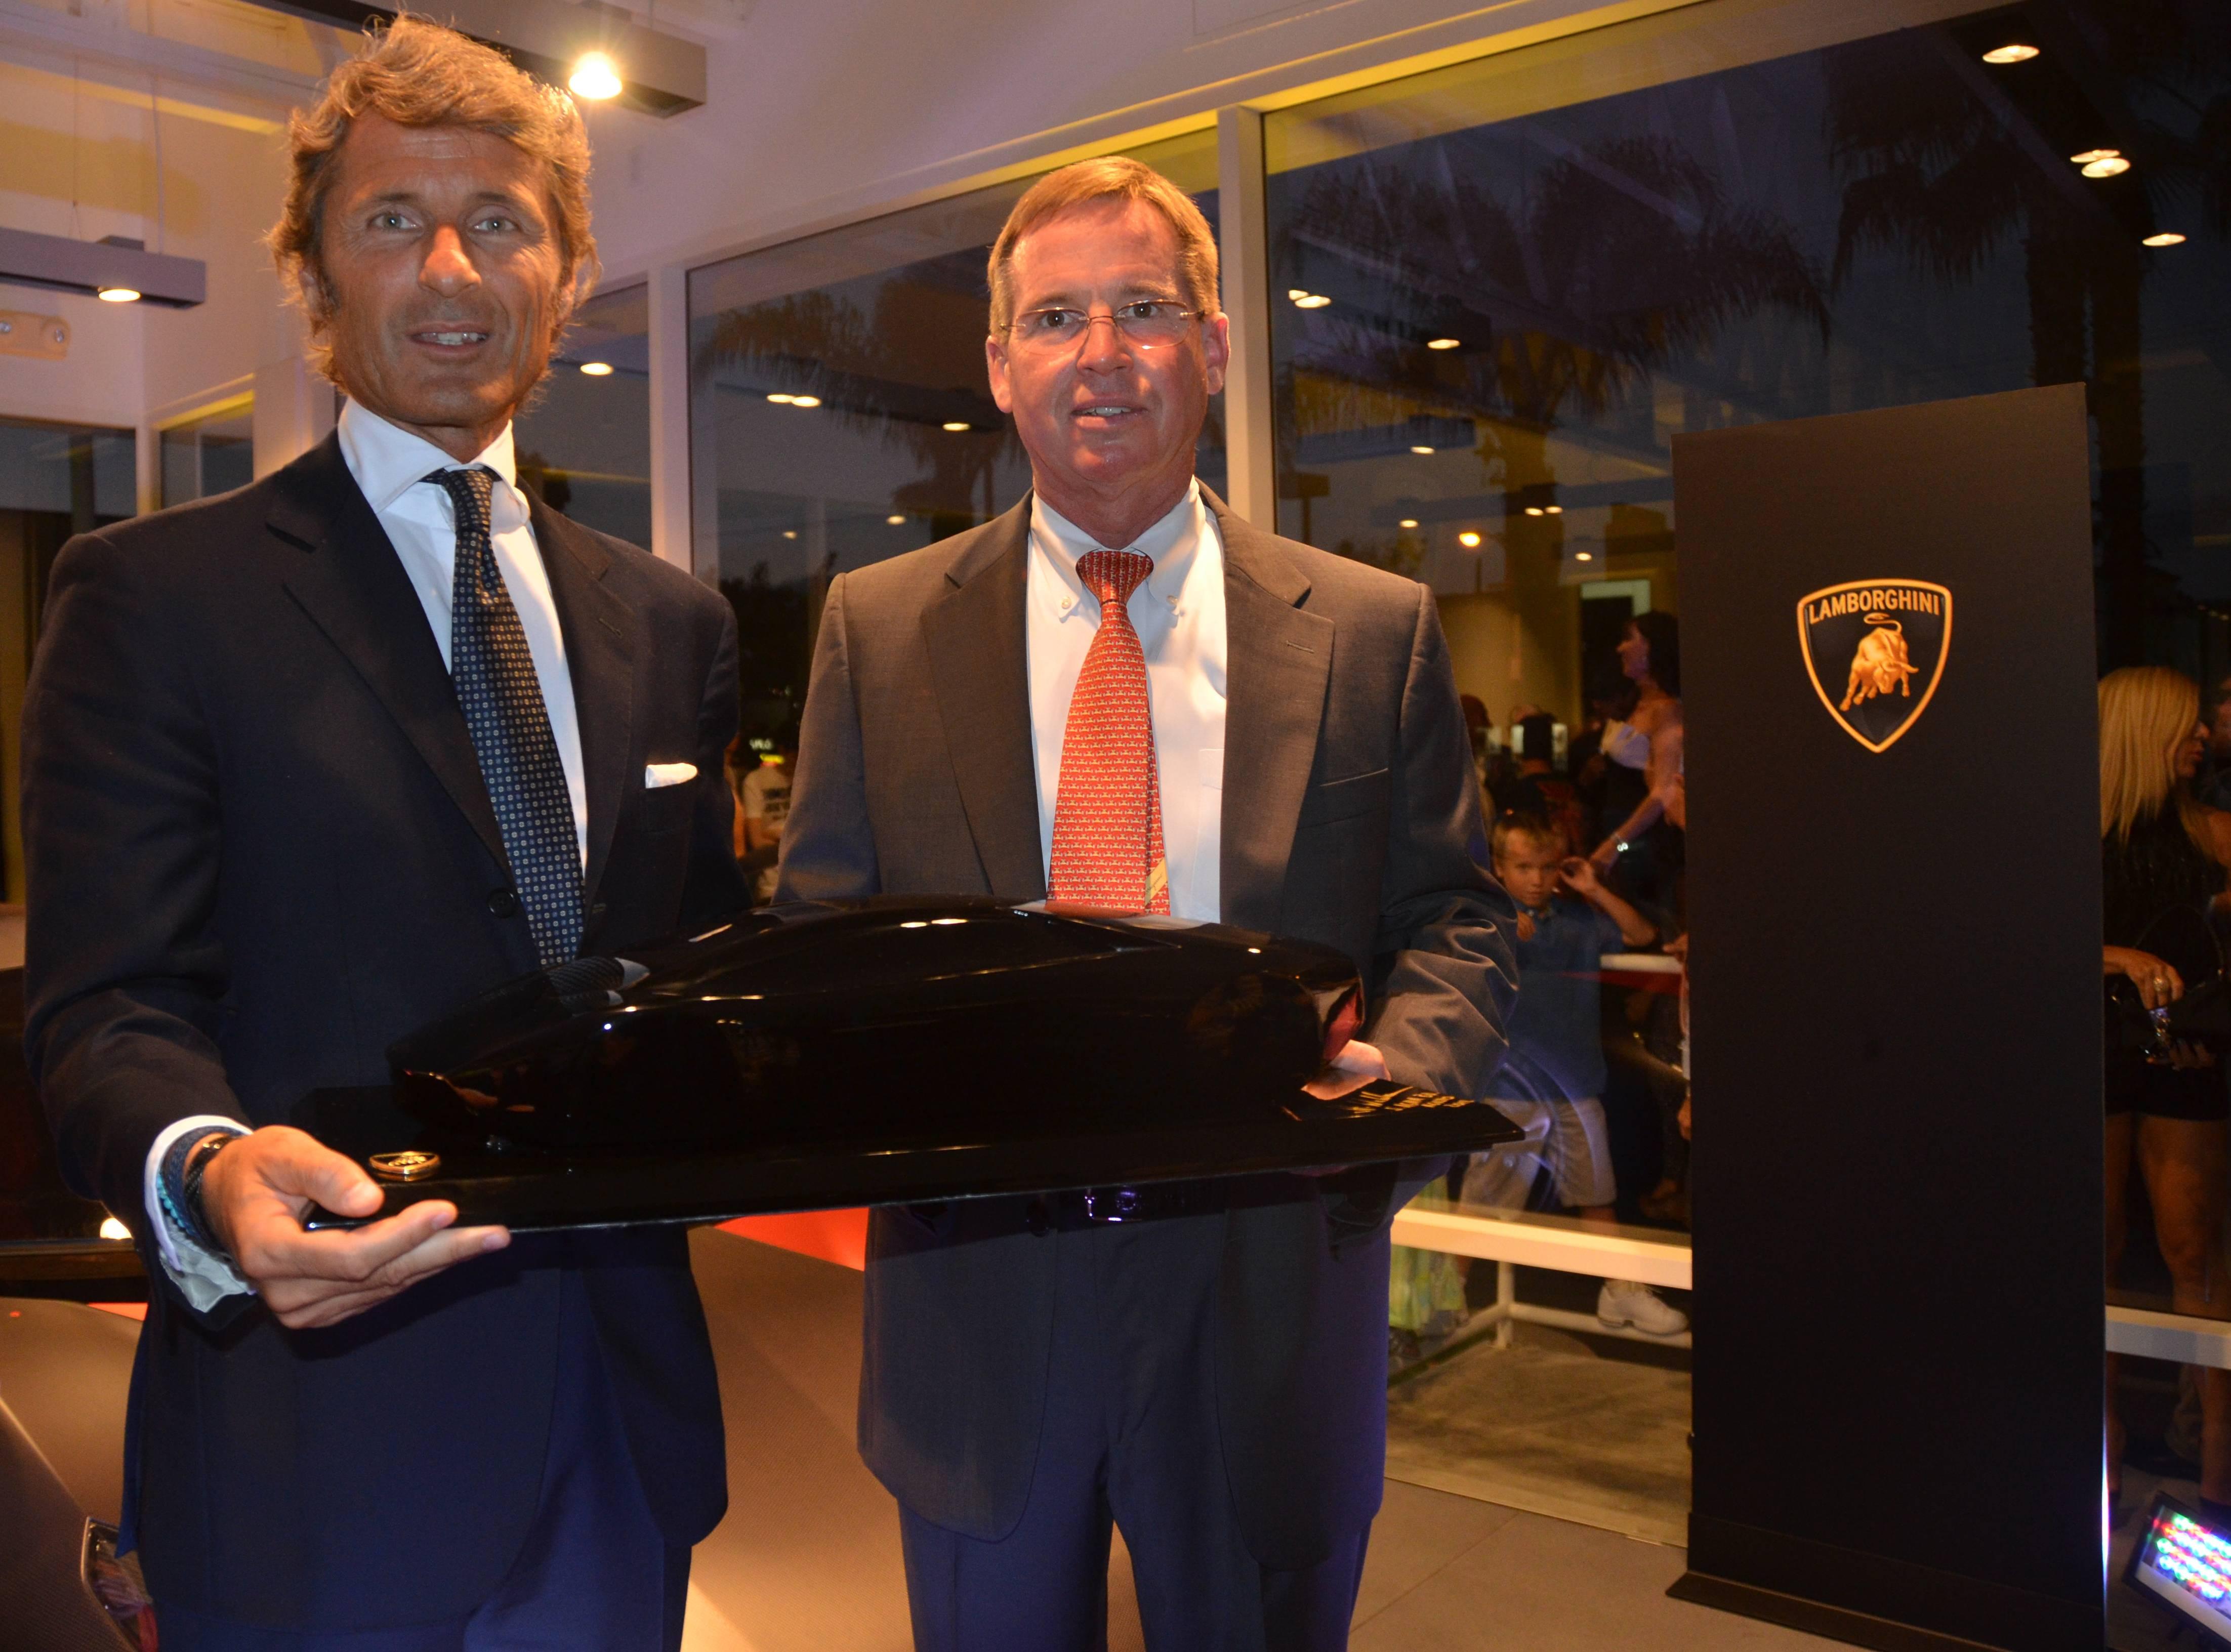 Lamborghini Newport Beach - Stephan Winkelmann (left) and Bill Story (right)